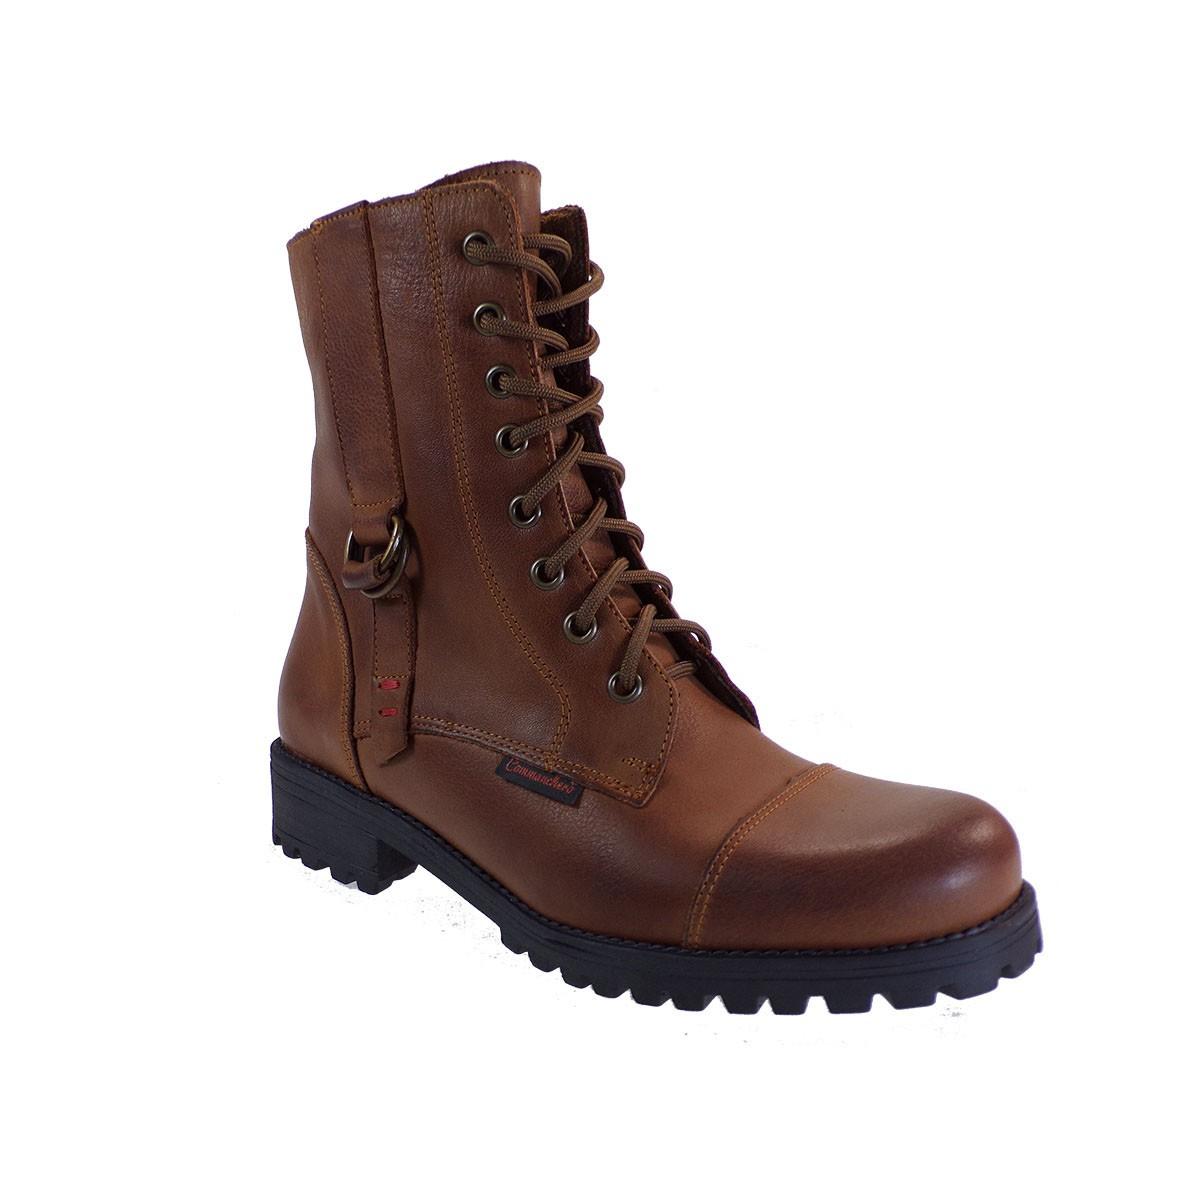 Commanchero Γυναικεία Παπούτσια Μποτάκια Αρβυλάκια 5280-726 Ταμπά Δέρμα